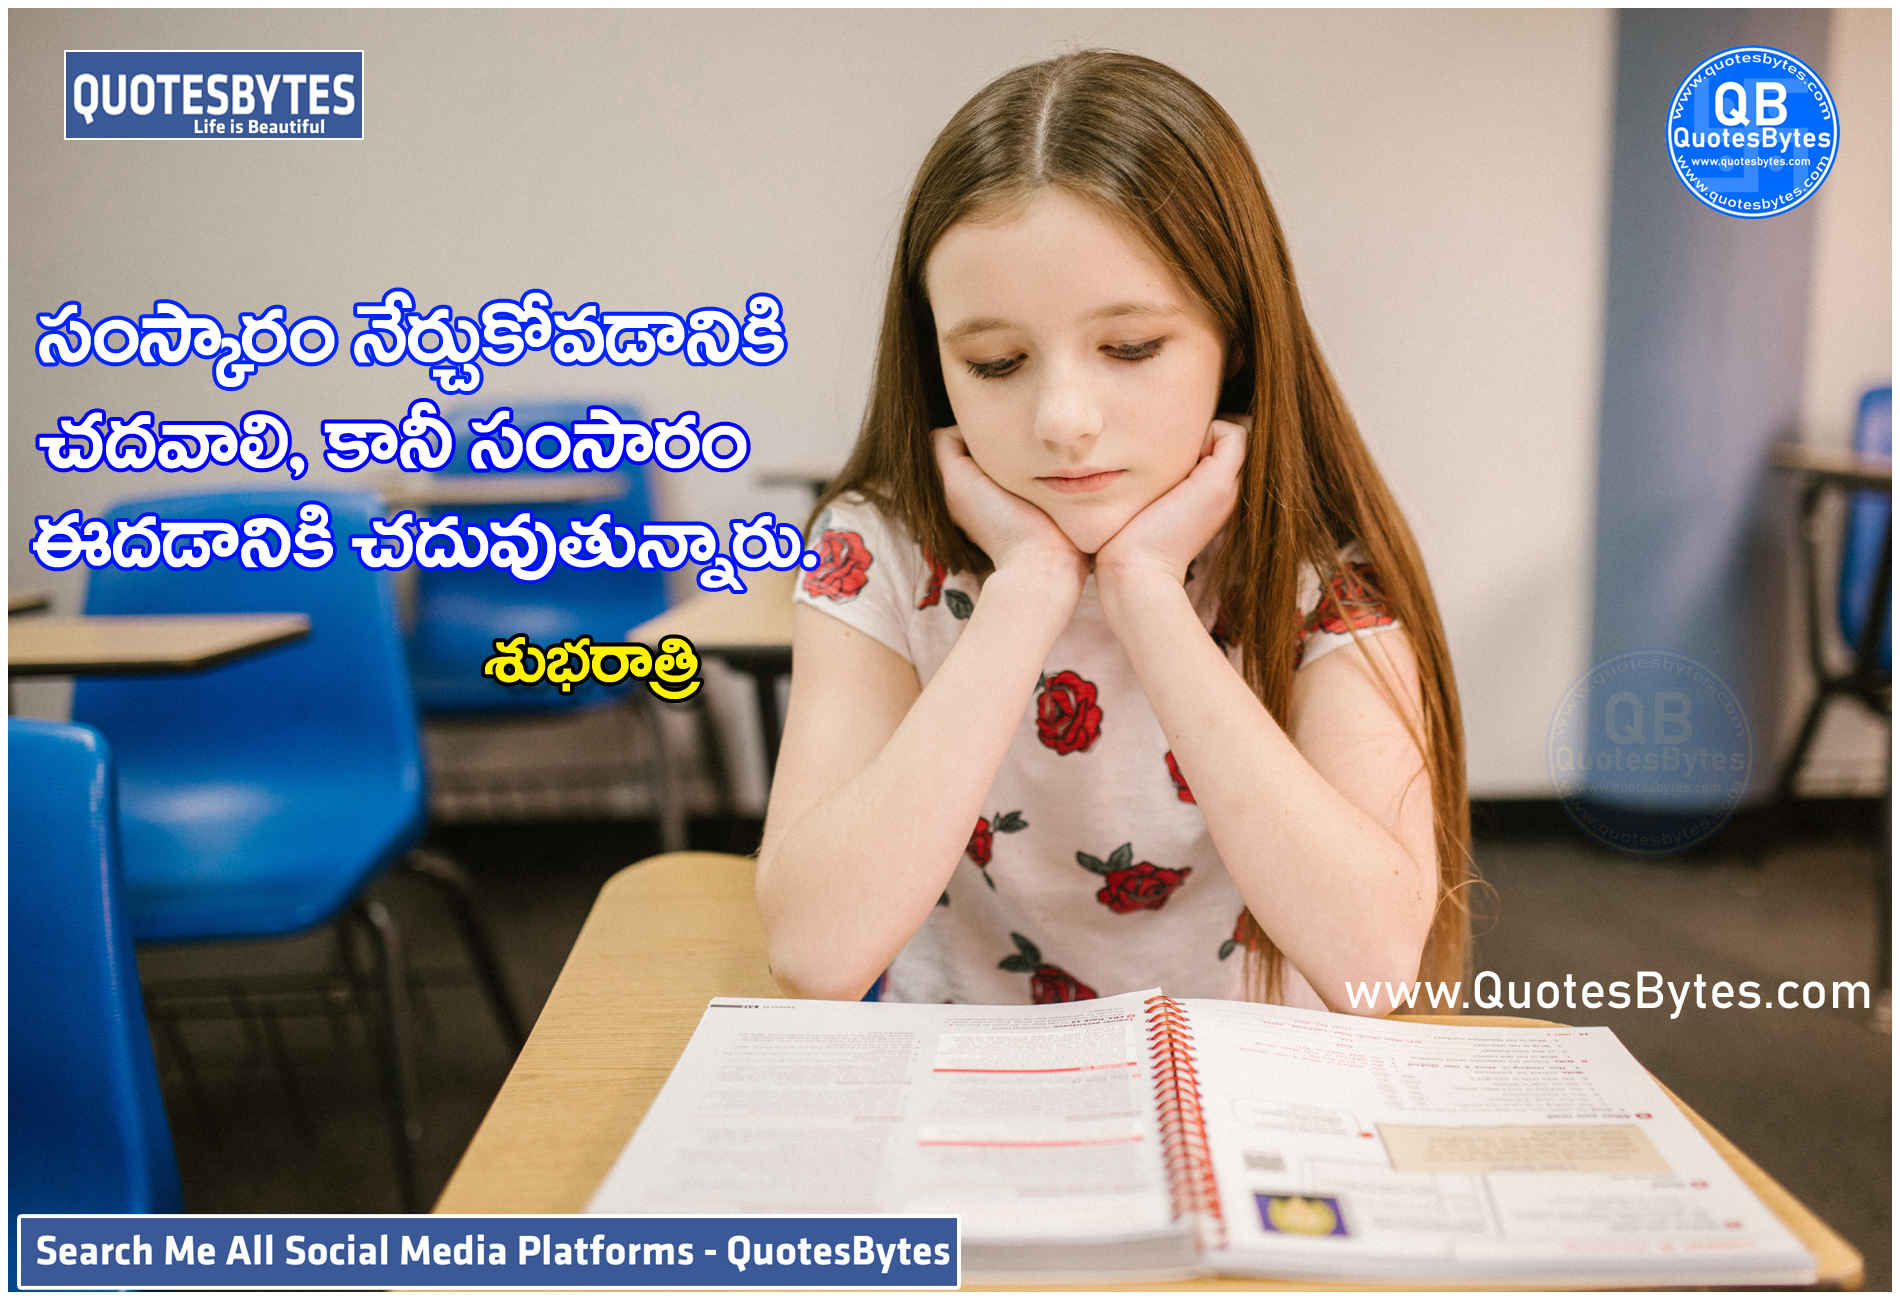 Good night in Telugu,Good Night Quotes in Telugu,GOODNIGHT: QUOTES, IMAGES, SMS, WHATSAPP STATUS, WISHES, GREETINGS IN TELUGU,GoodNight Quotes Telugu,GoodNight Quotes in Telugu With Images,Telugu Good nightGreetings,Telugu Good NightQuotes,GoodNight Quote In Telugu,Best Good Night Quotes in Telugu with Images for 2021,Good Night Quotes Inspirational In Telugu,Telugu Good Night Inspirational Quotes-Messages On Life In Telugu,GoodNight Telugu Images with Quotes,Heart touching good night quotes in telugu,GoodNight Quotes In Telugu,Telugu New good night quotes and Wishes 2021,Good Night Wishes in Telugu,Beautiful Good night quotes in telugu ,Good Night Quotes With Images,GoodNight Quotes, Wishes In Telugu [ Latest 2021 ],Telugu Inspirational Good NightQuotes,GoodNight Telugu Quotes,Telugu Good Night Quotes images,Telugu inspirational Quotes images, Telugu Good night quotes in telugu,GoodNight Inspirational Quotes Telugu,goodnightkavithalu images in telugu,Best Good Night Quotes Telugu Images,latest quotes about good nightquotes,Best Good Night Quotes and Wishes,latest quotes in telugu,Best Good Night Quotes In Telugu - Day Wishs,latest quotes for inspirational quotes in telugu,GoodNight Quotes Status SMS,toptelugu good night quotes in telugu,GoodNight Quotes Inspirational In Telugu,latestkavithalu image in telugu,Fresh Good Night Messages In Telugu,Good Night Telugu,good night images,good night quotes,funny good night .